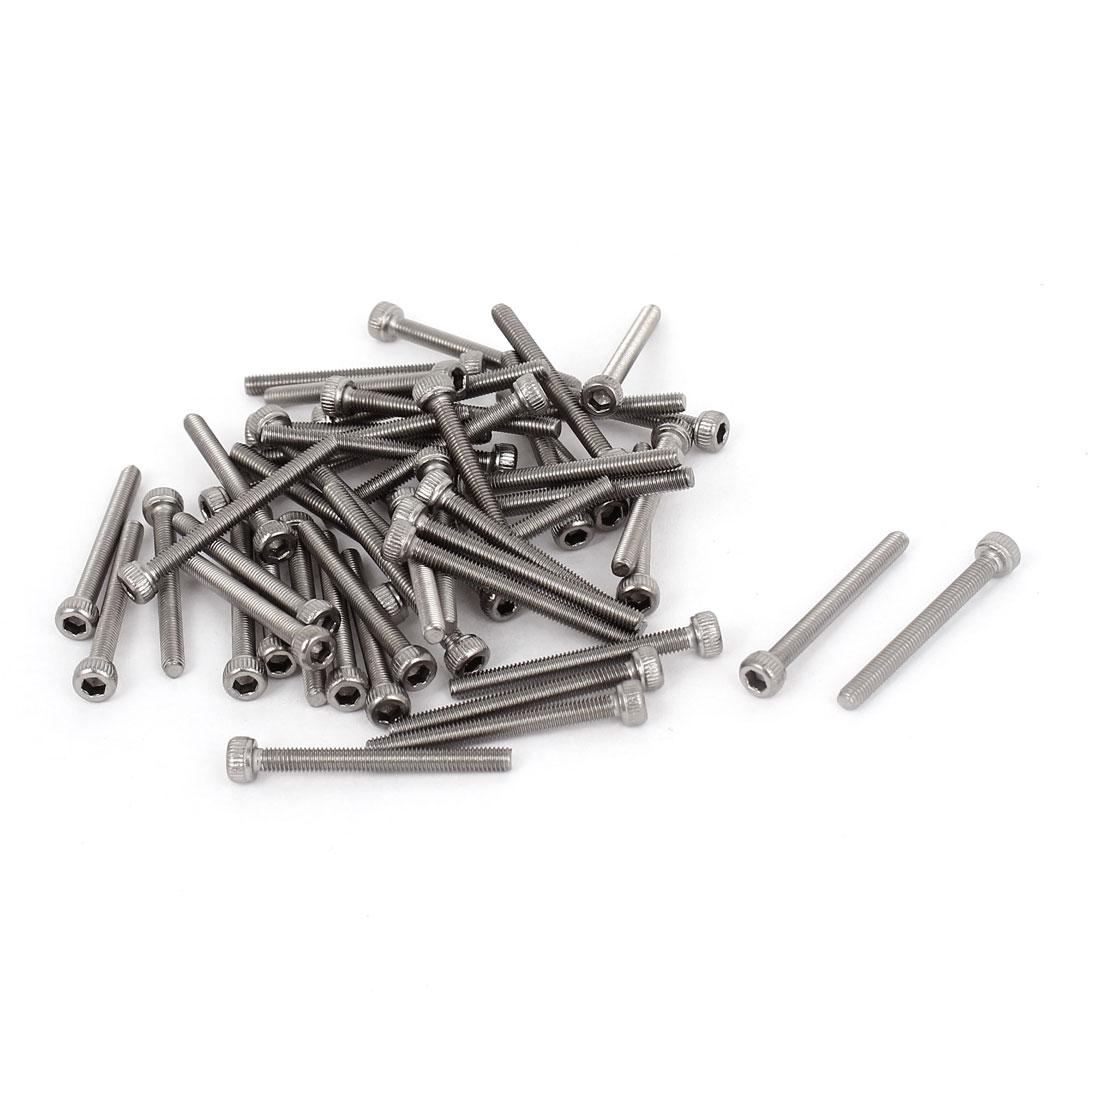 M3x30mm 0.5mm Pitch Stainless Steel Bolts Socket Cap Head Hex Key Screws 50pcs